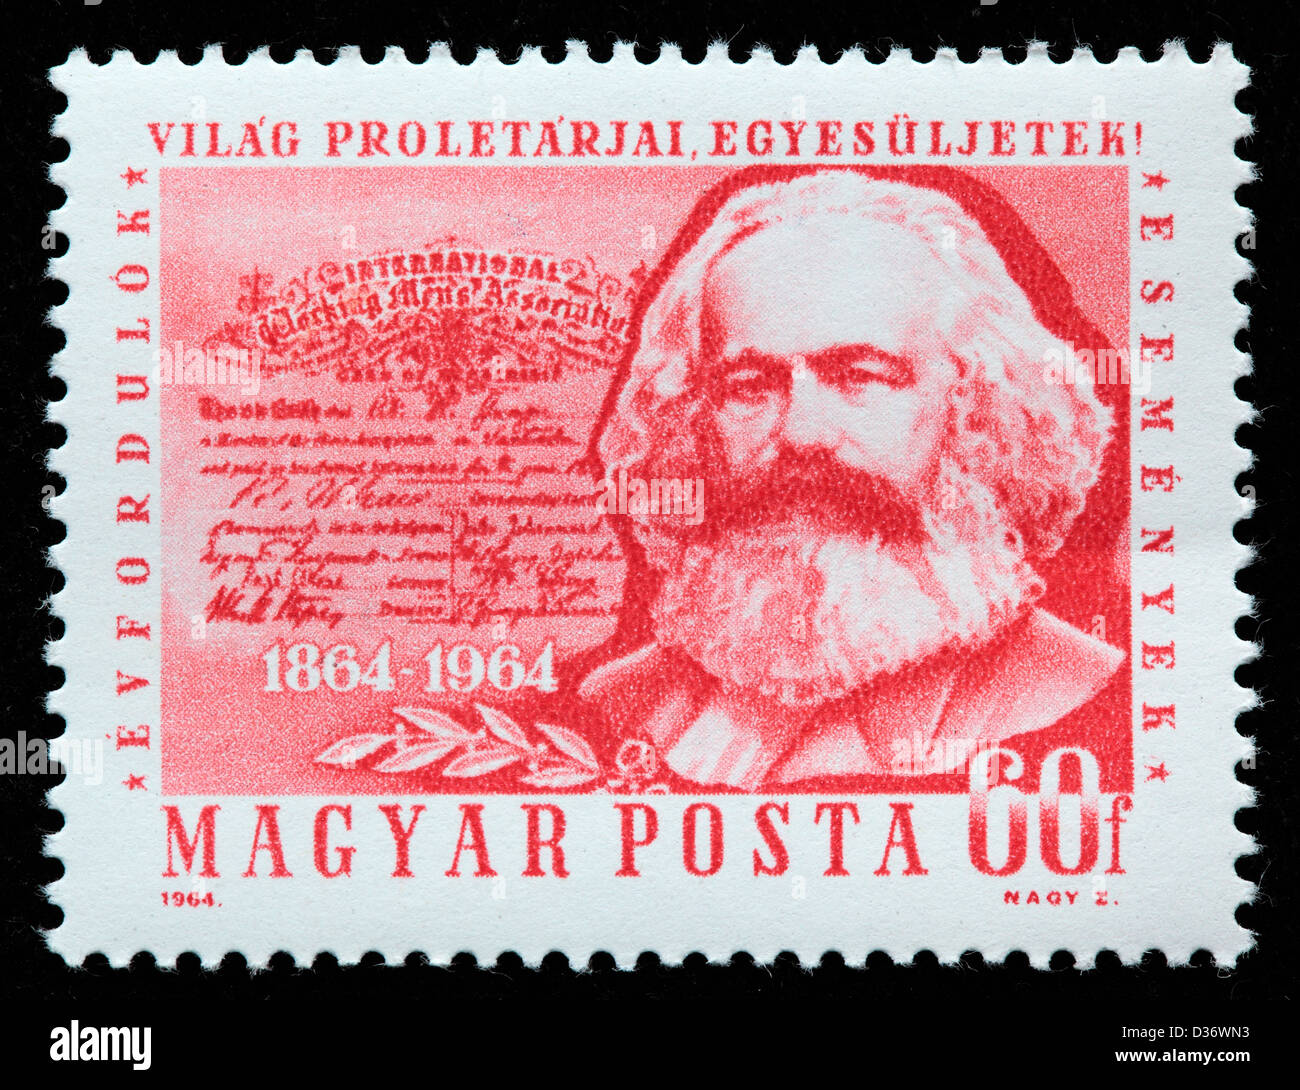 Karl Marx, postage stamp, Hungary, 1964 - Stock Image